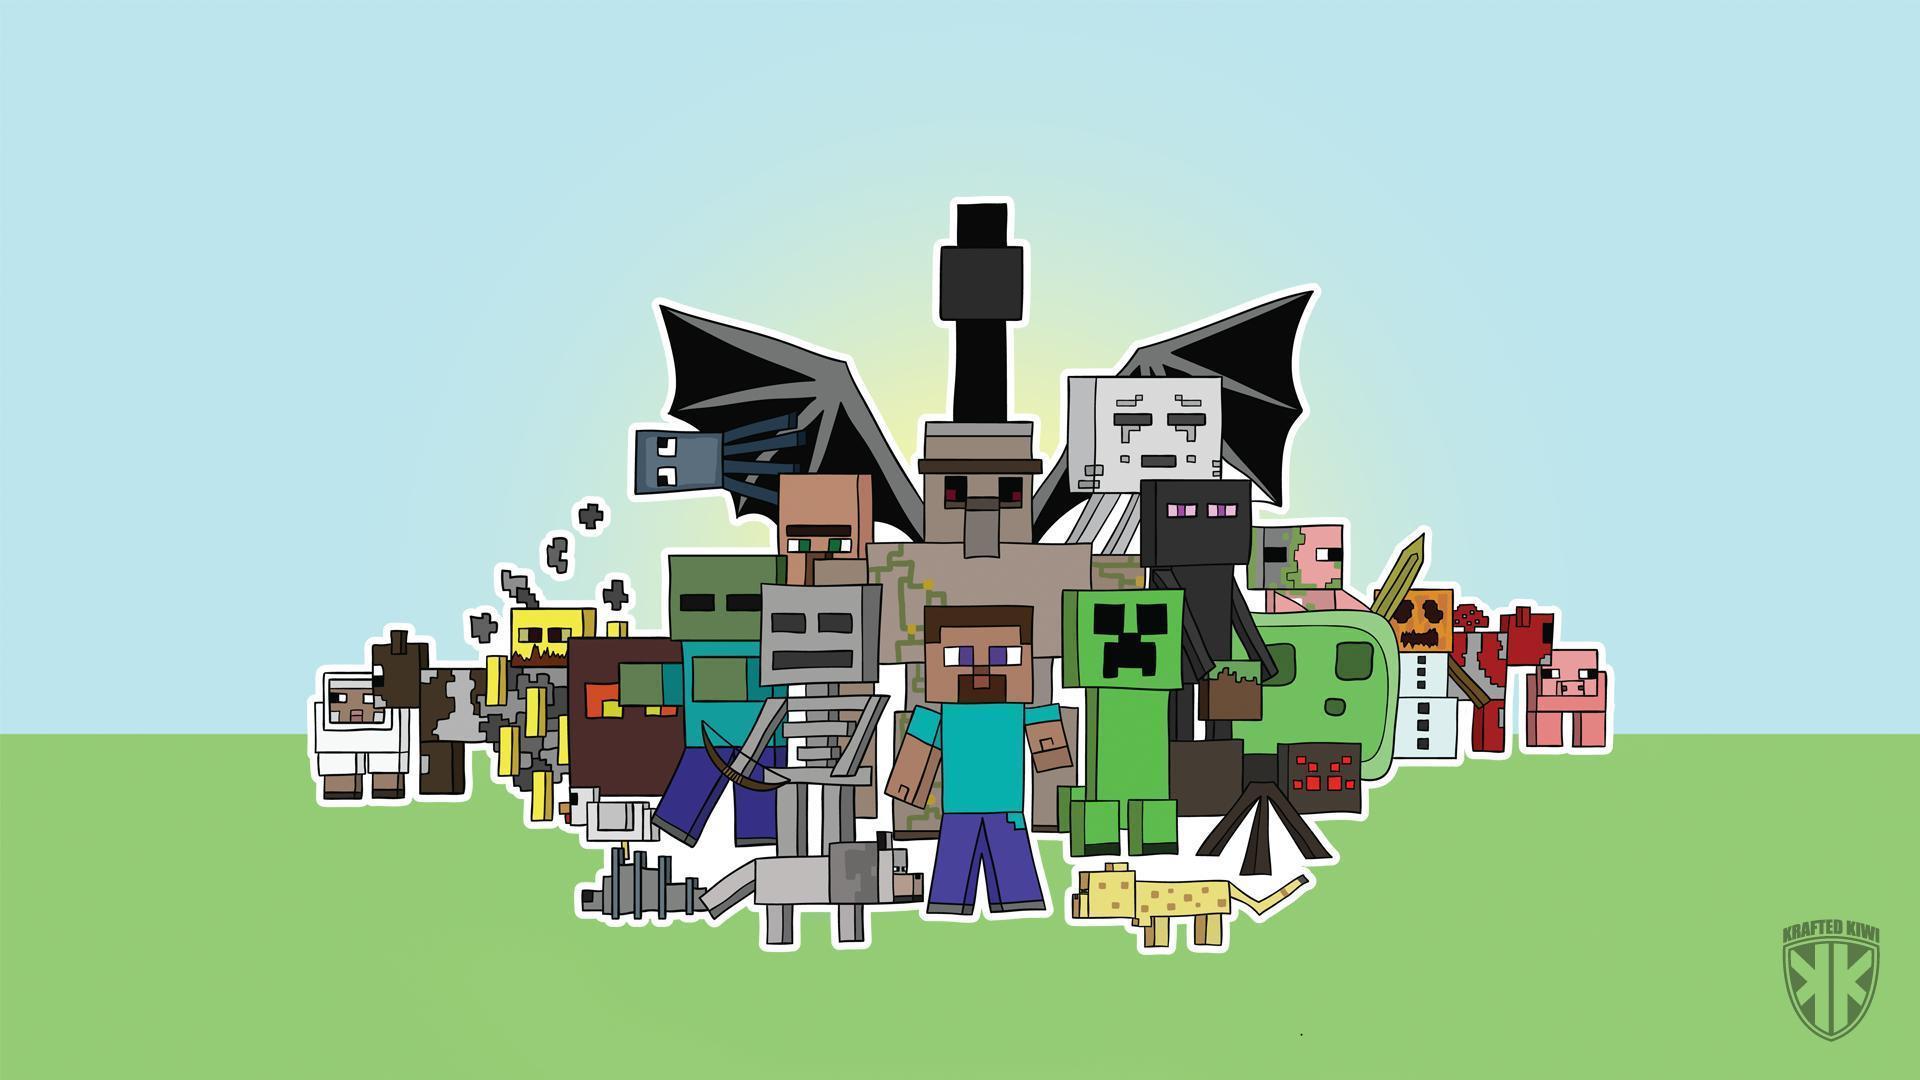 Cute Minecraft Wallpaper Iphone